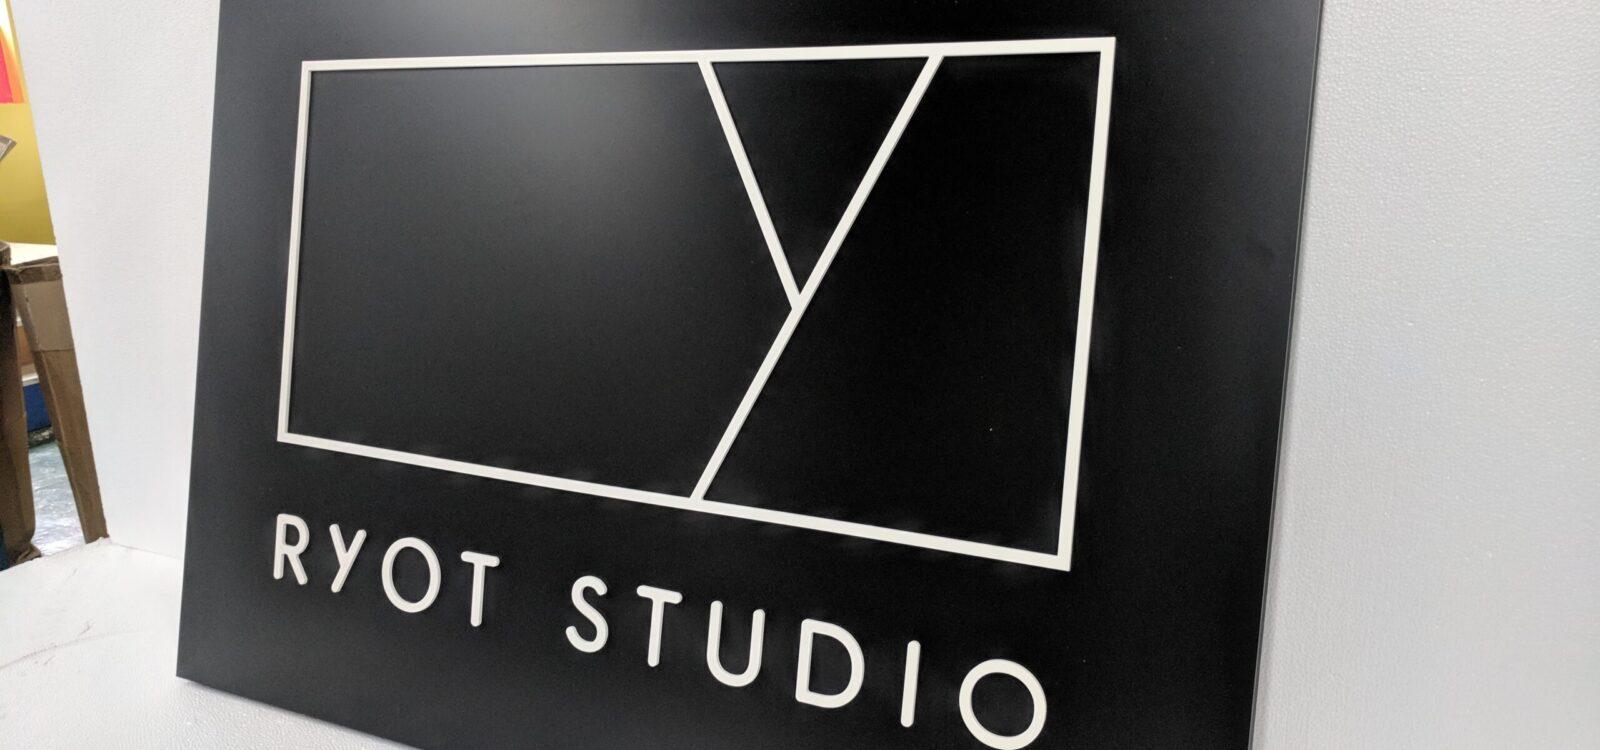 Foamex Faced Ryot Studio Logo Mounted Onto Painted Black Polystyrene